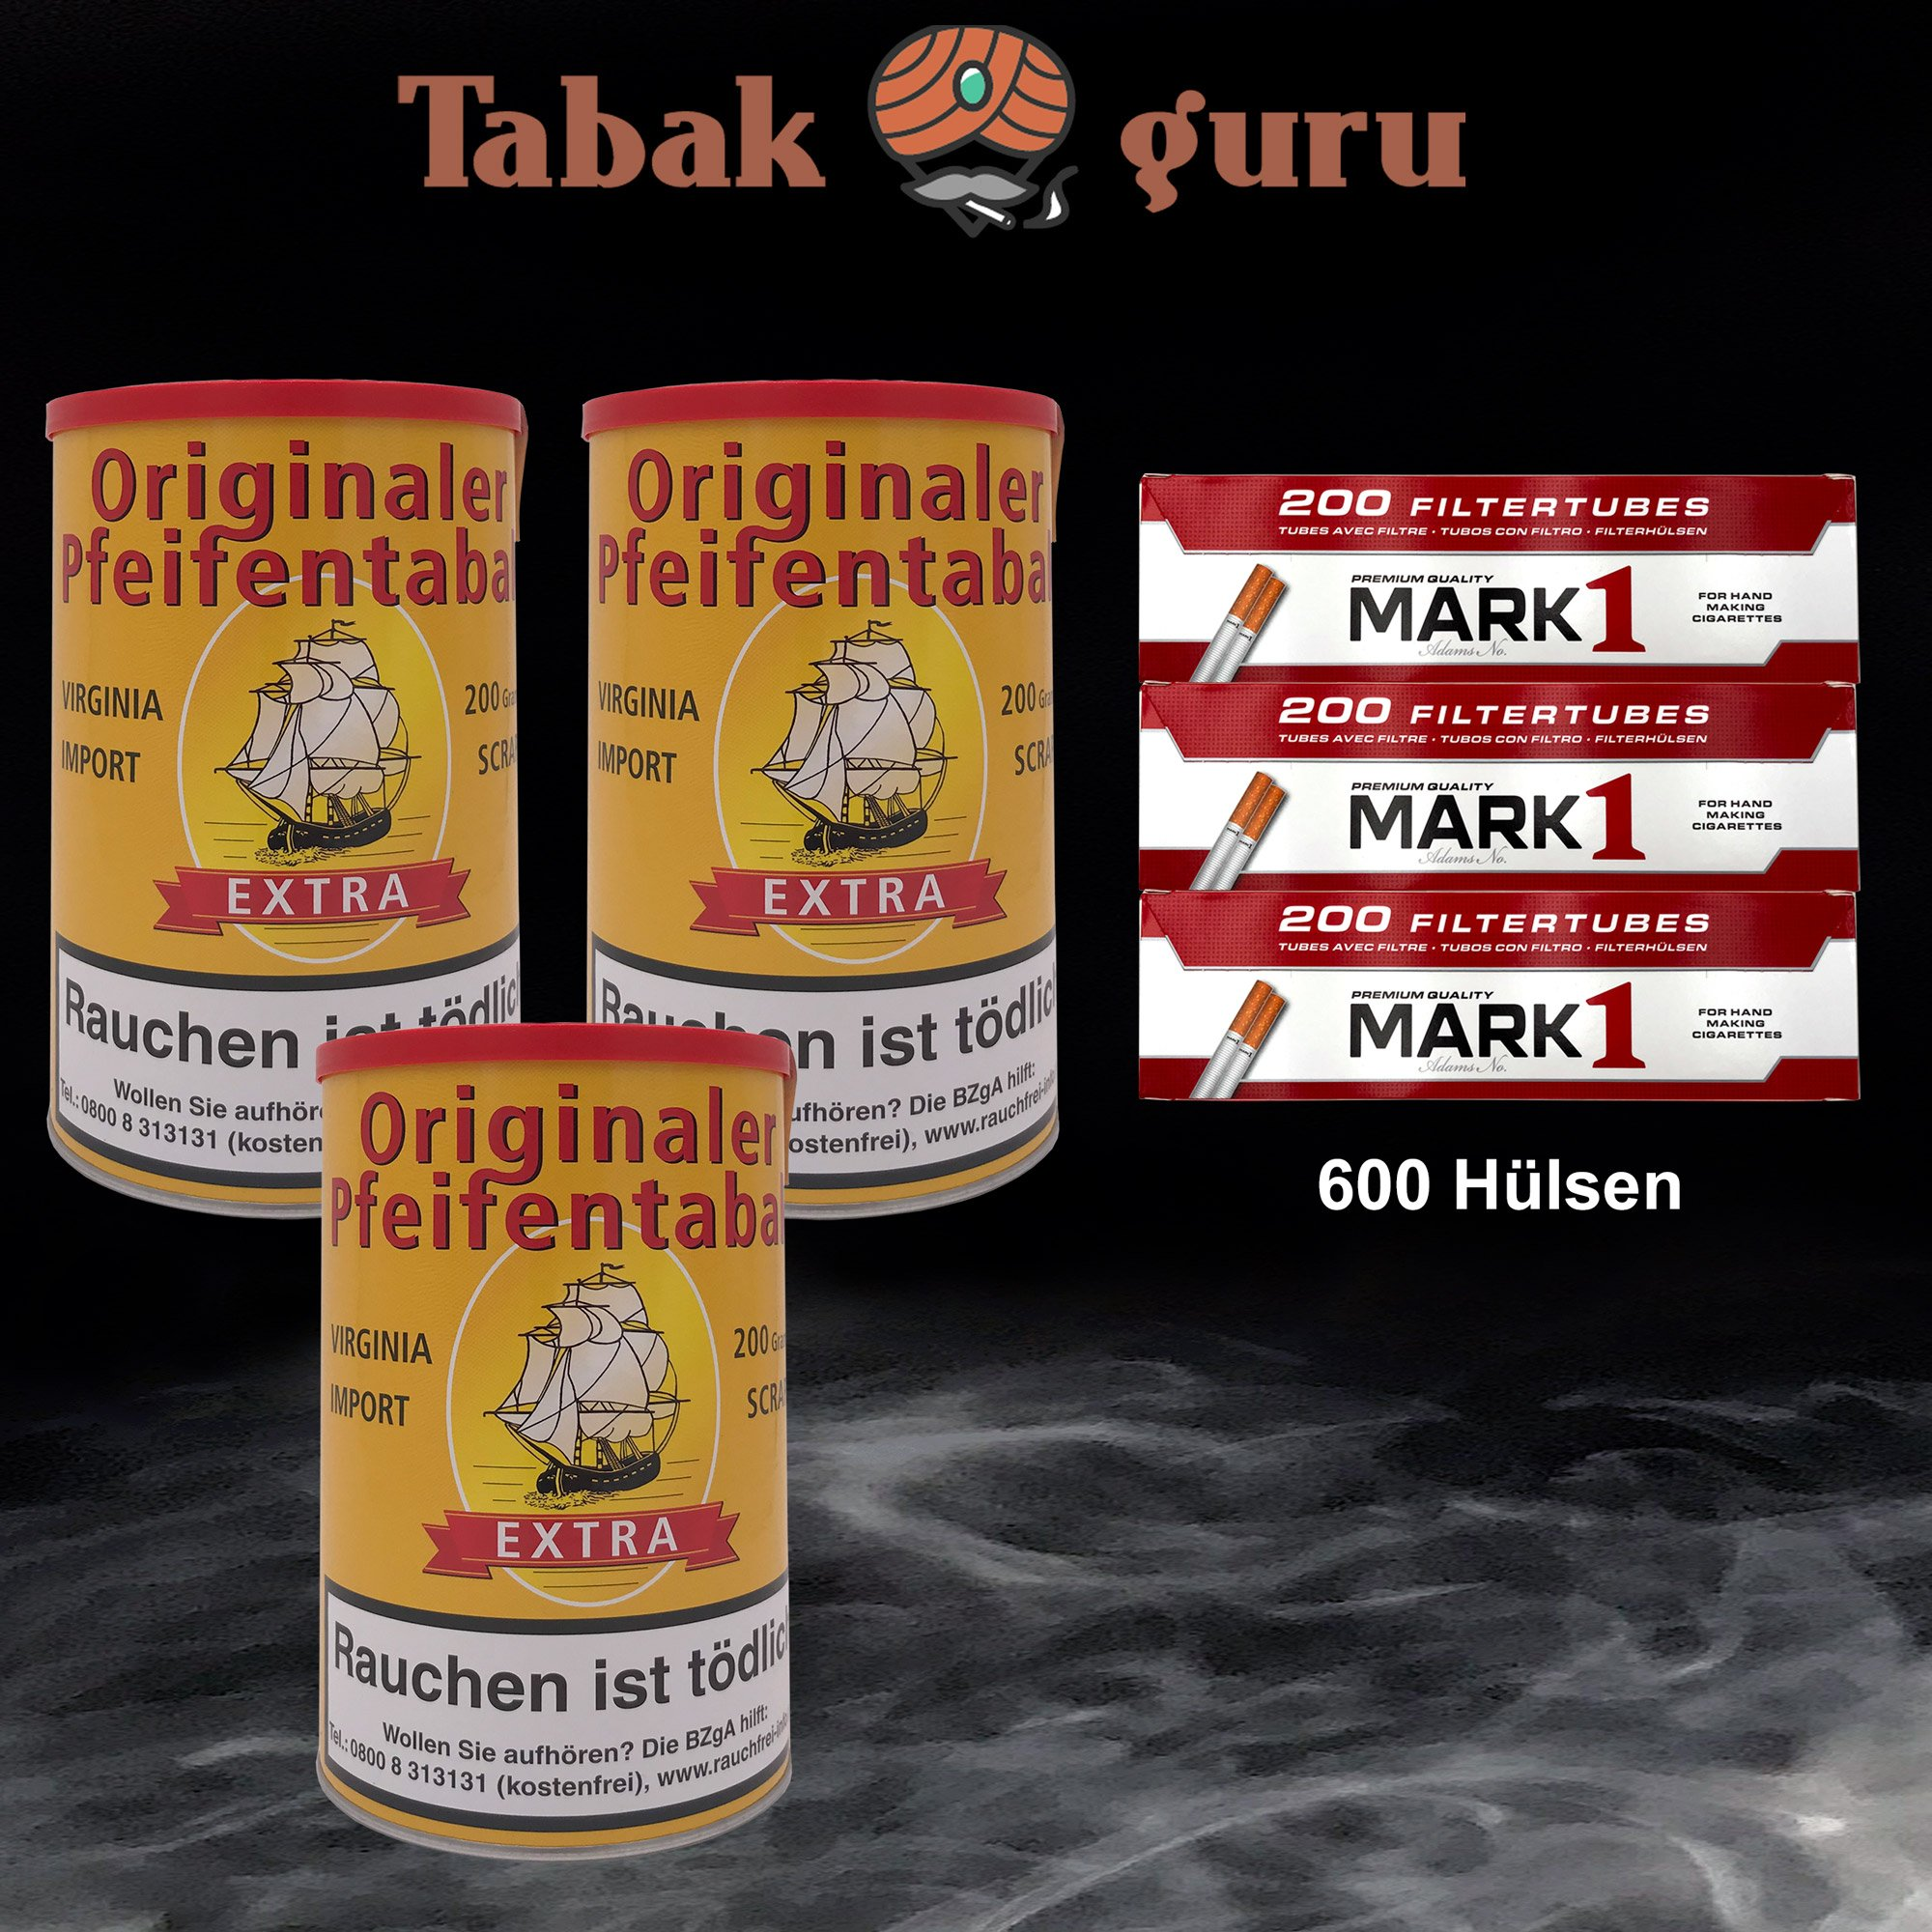 3 x Originaler Pfeifentabak Extra Inhalt 200g + 600 Mark1 Hülsen